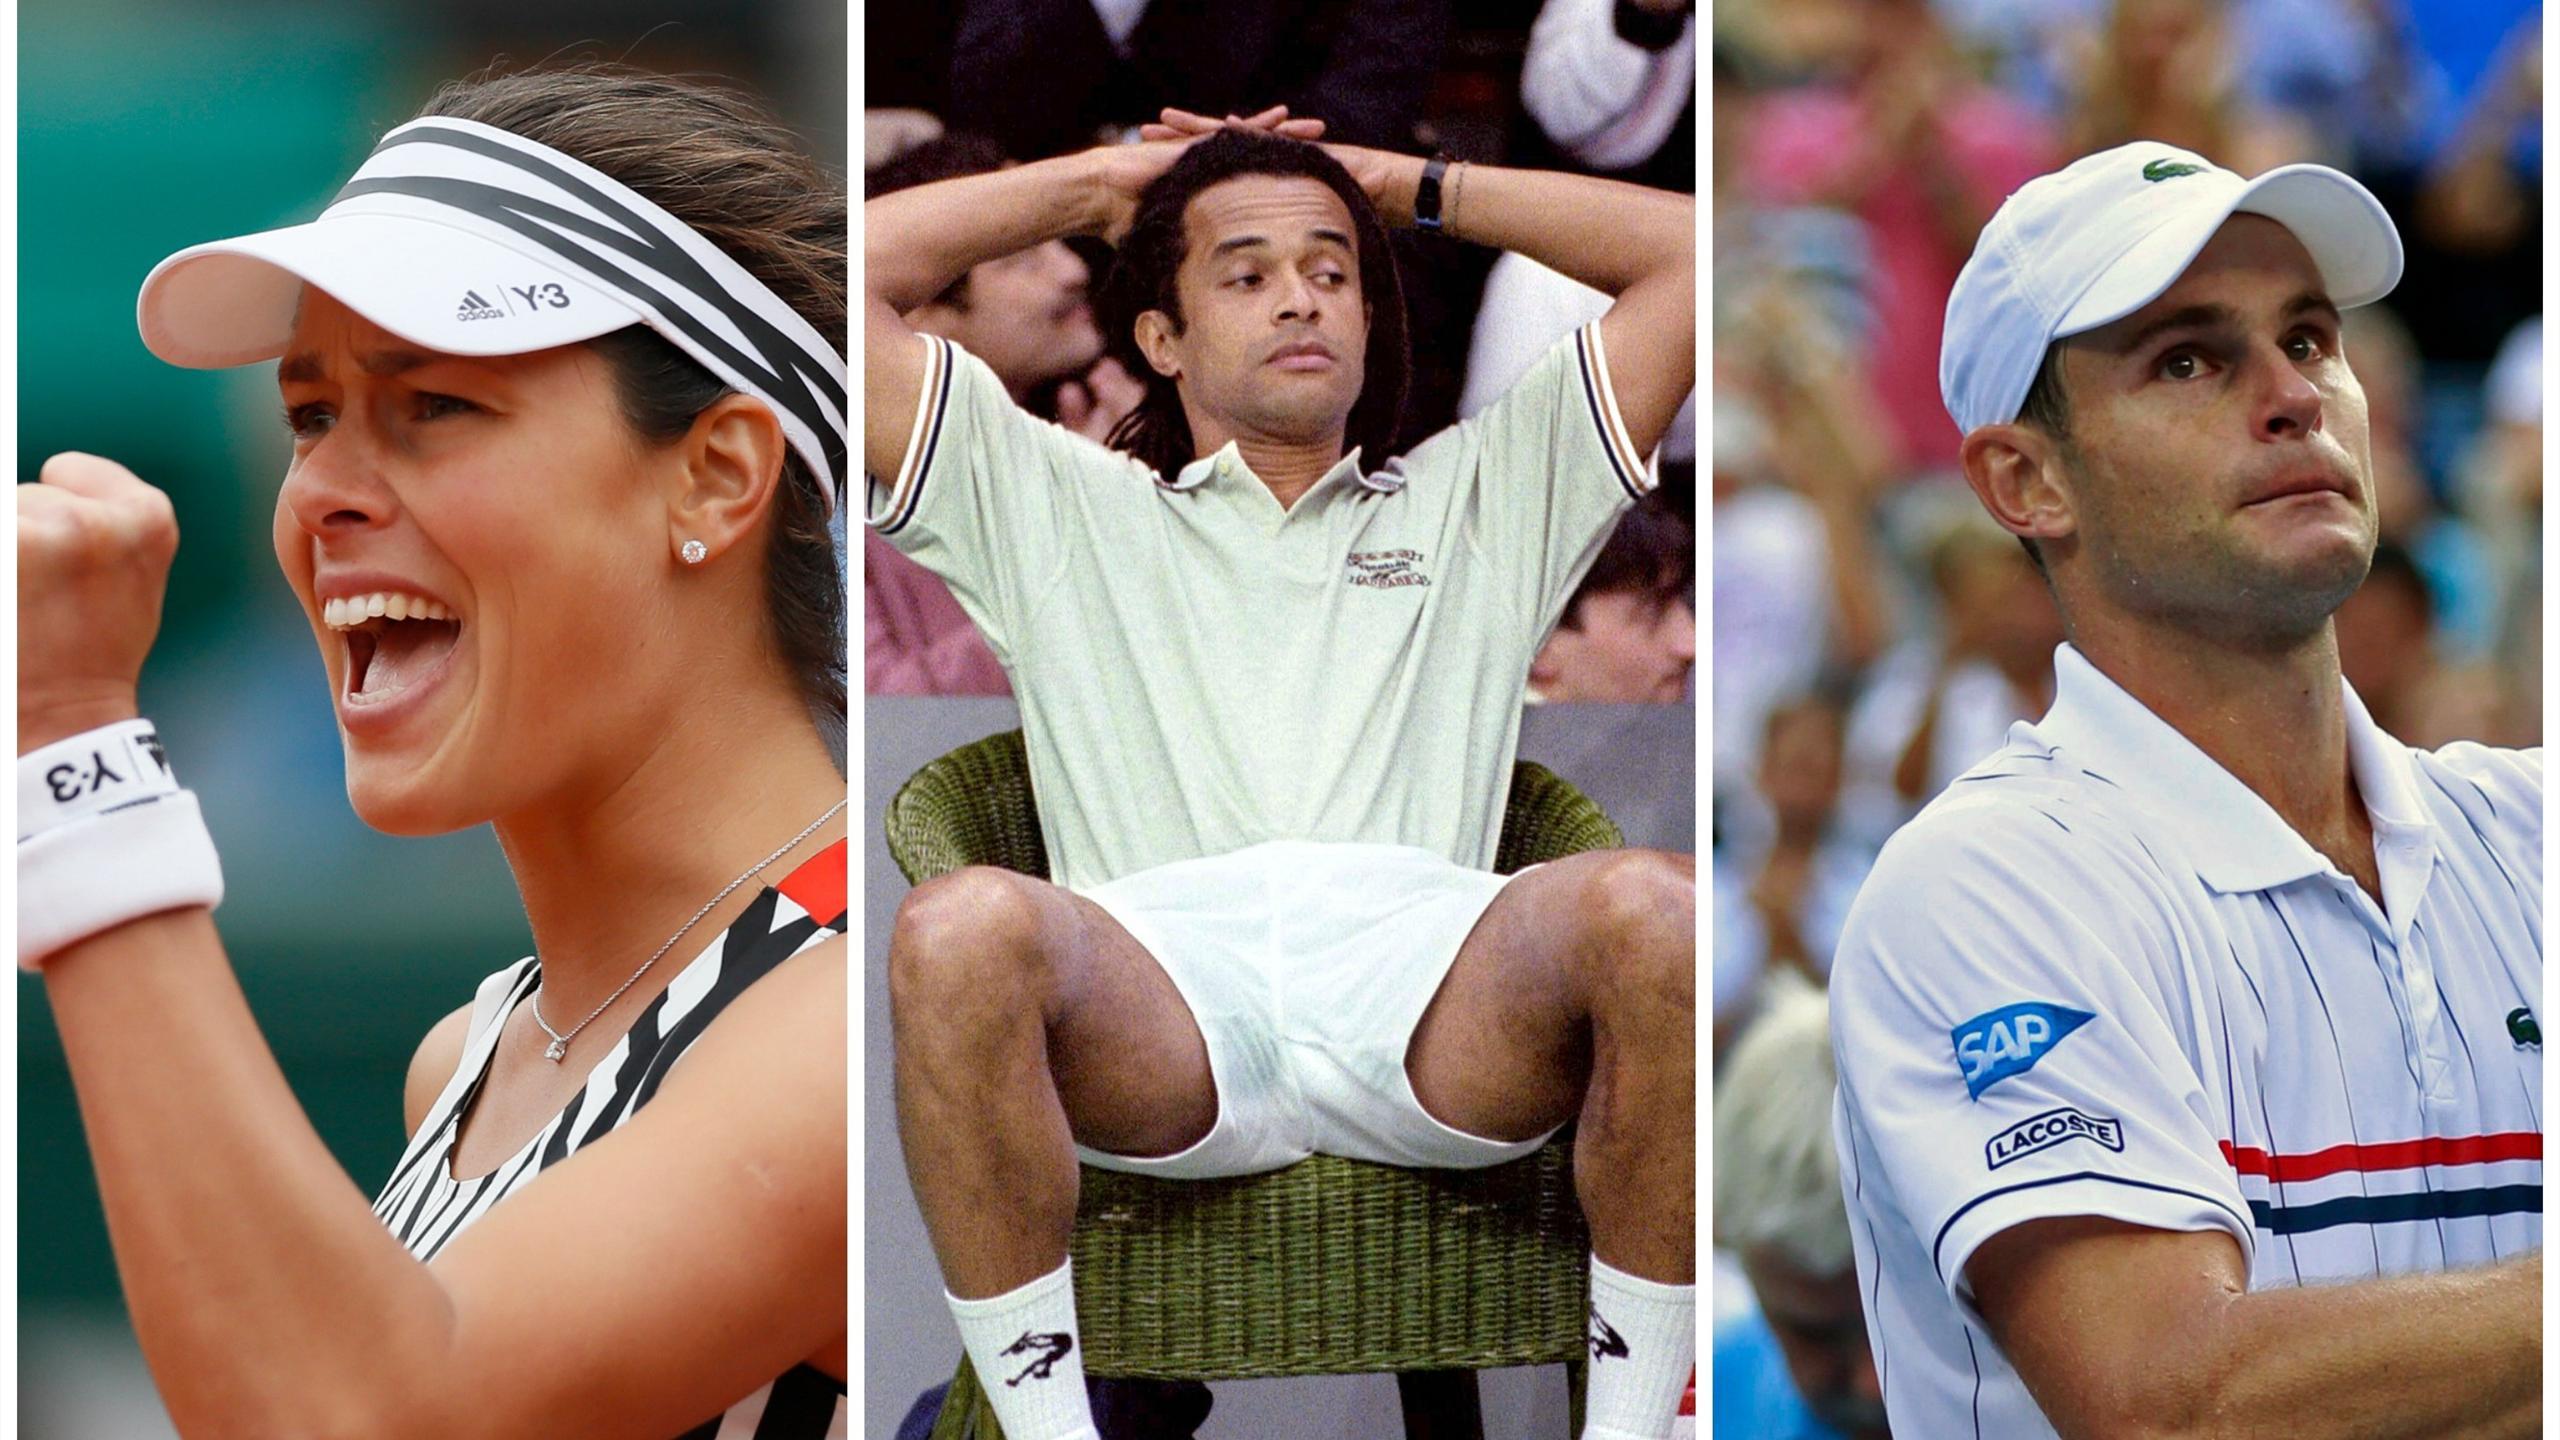 Ana Ivanovic, Yannick Noah and Andy Roddick